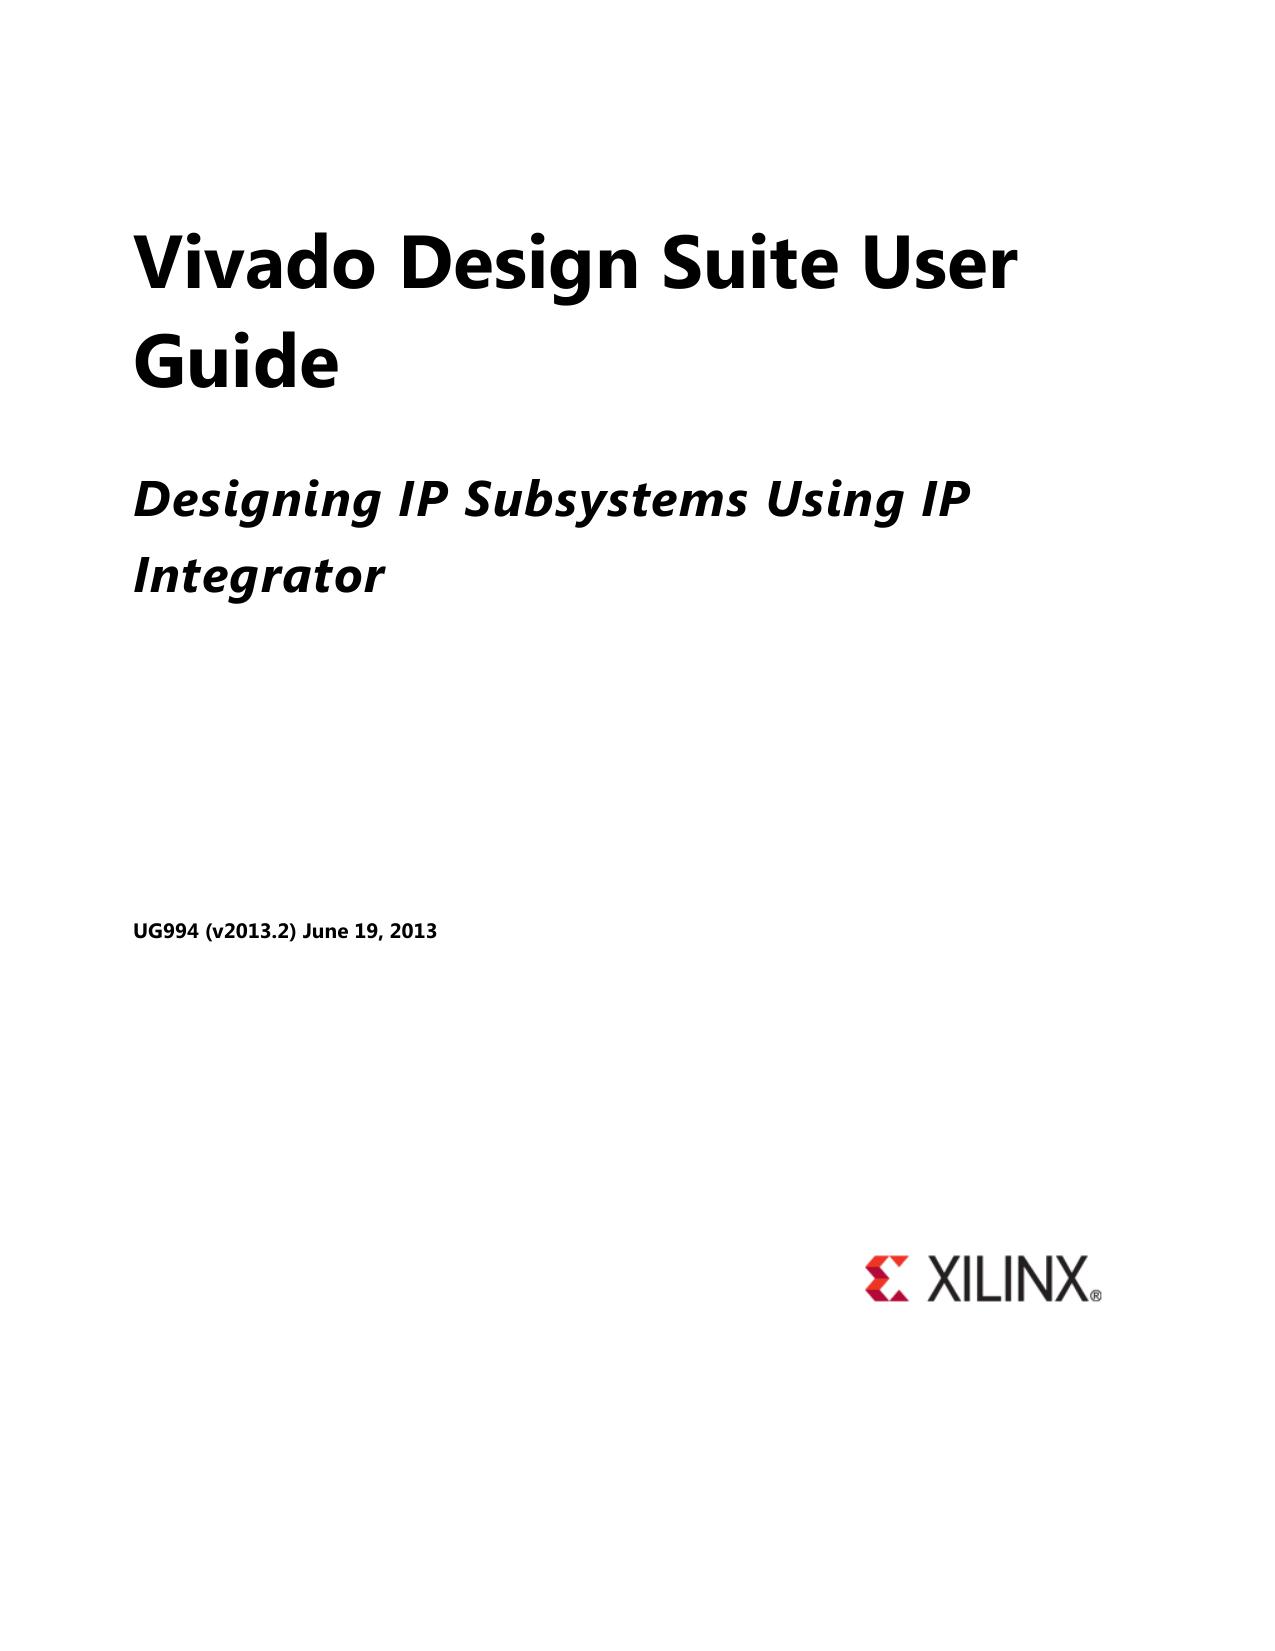 Xilinx Vivado Design Suite User Guide: Designing IP Subsystems